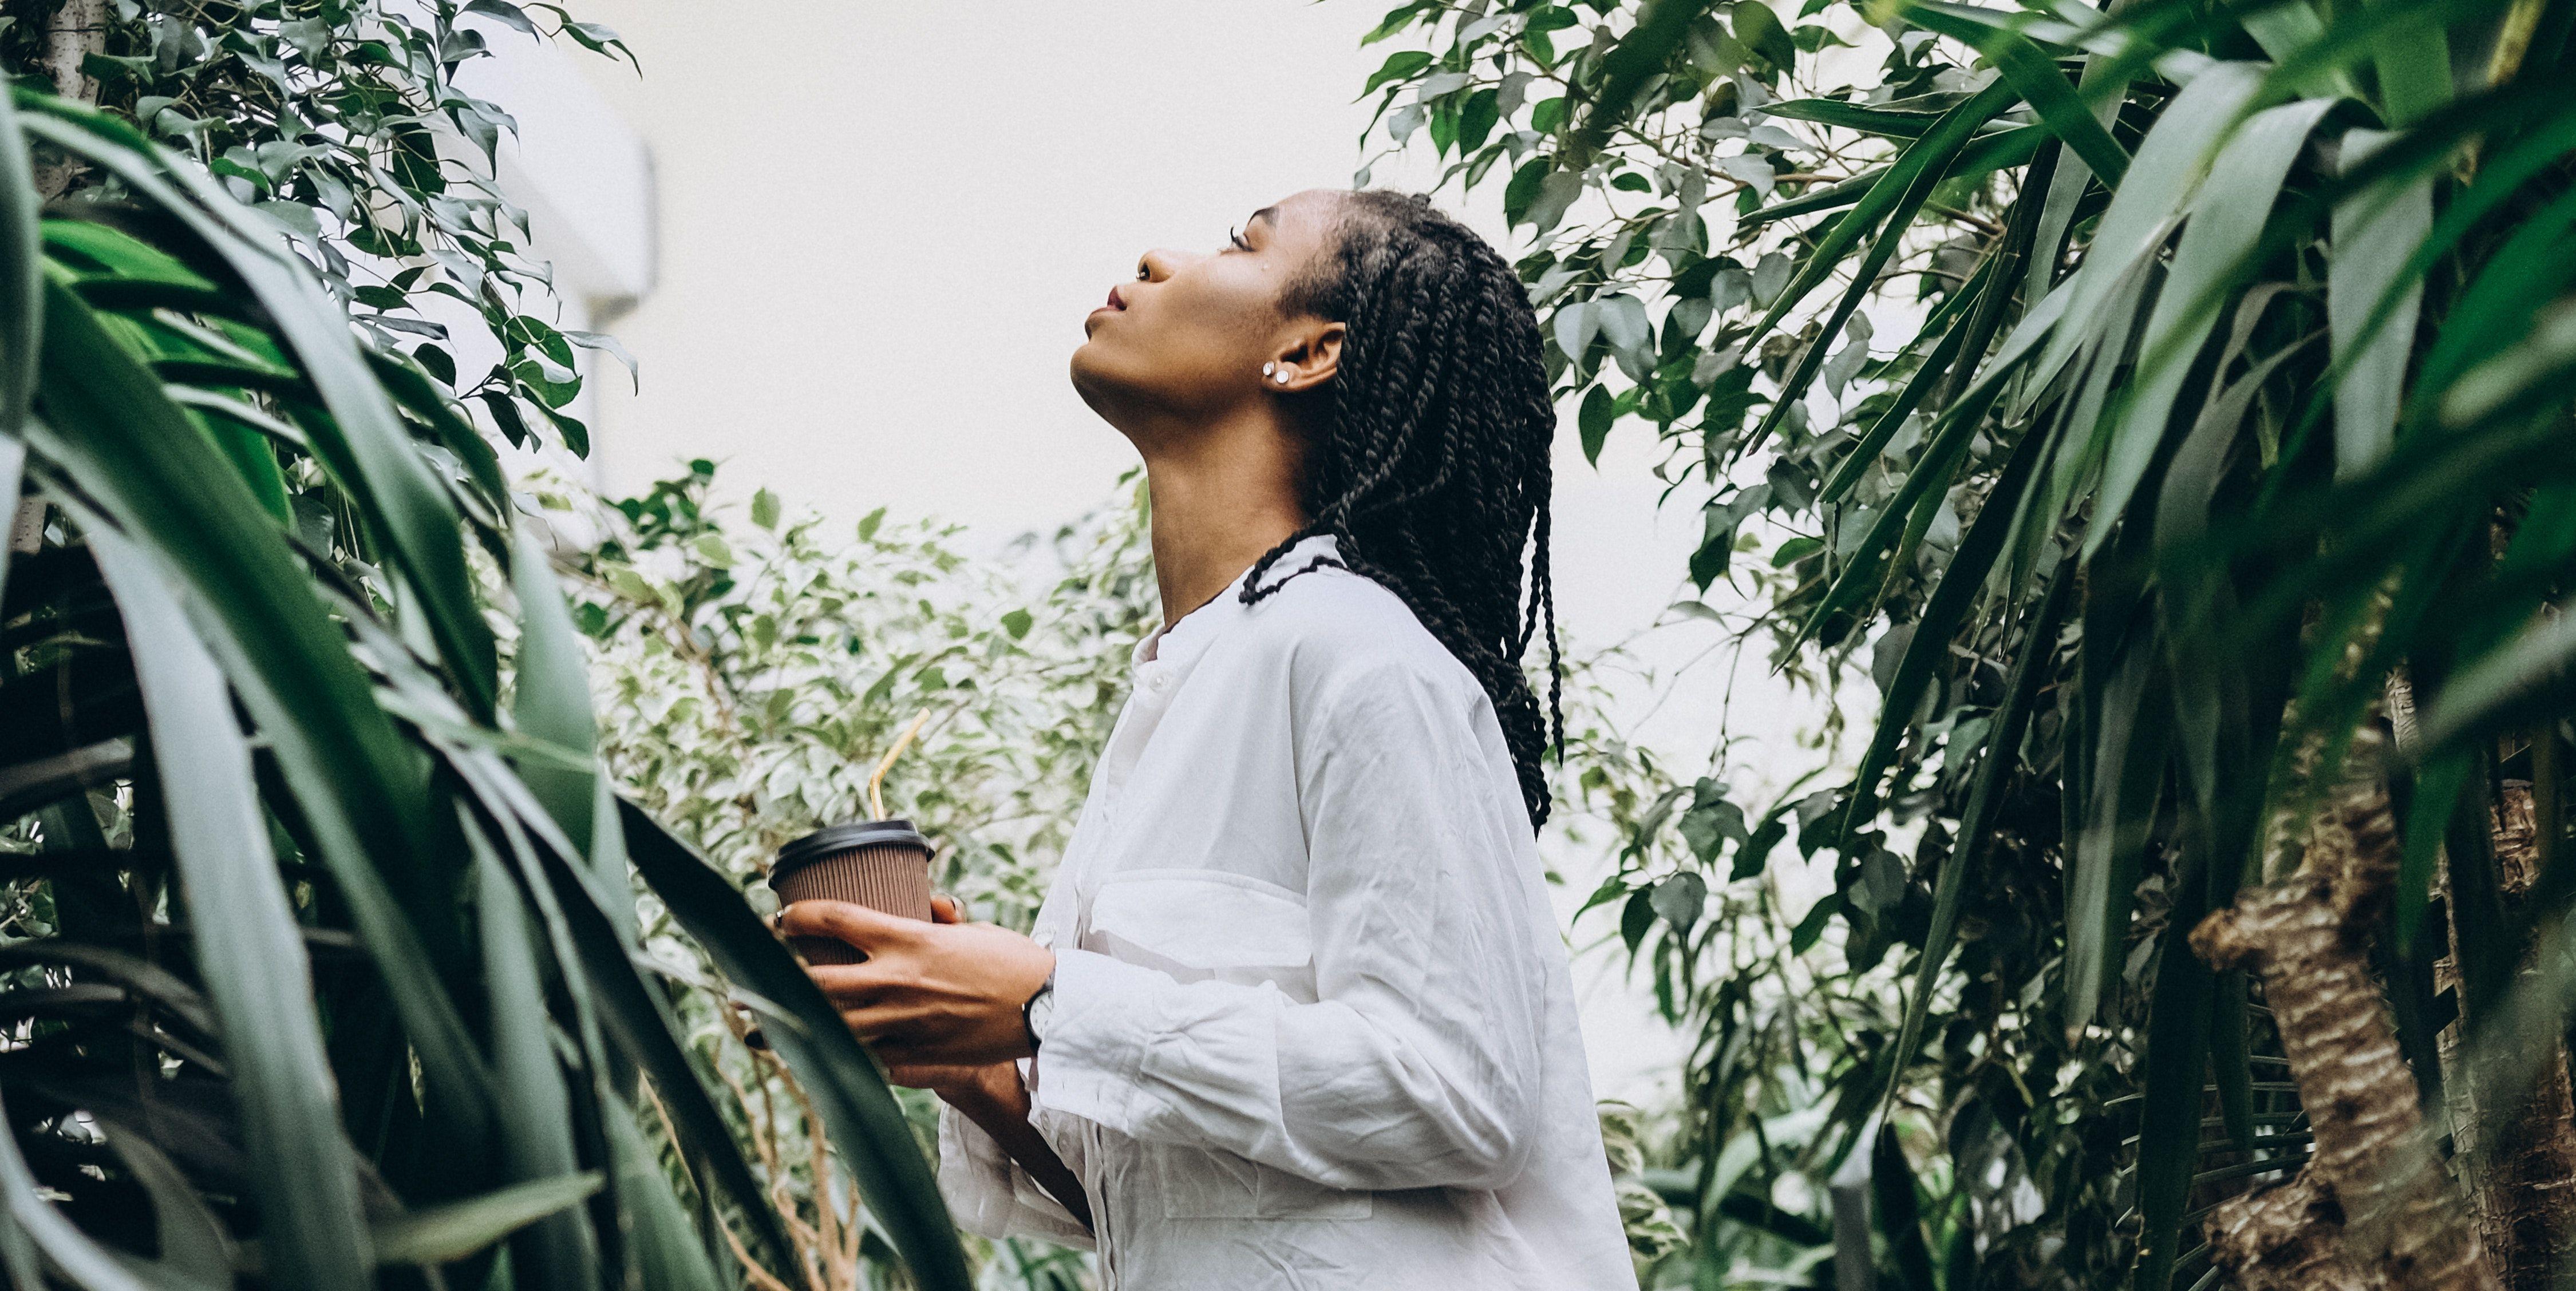 Does Vicks Vapor Rub Help Tighten Skin